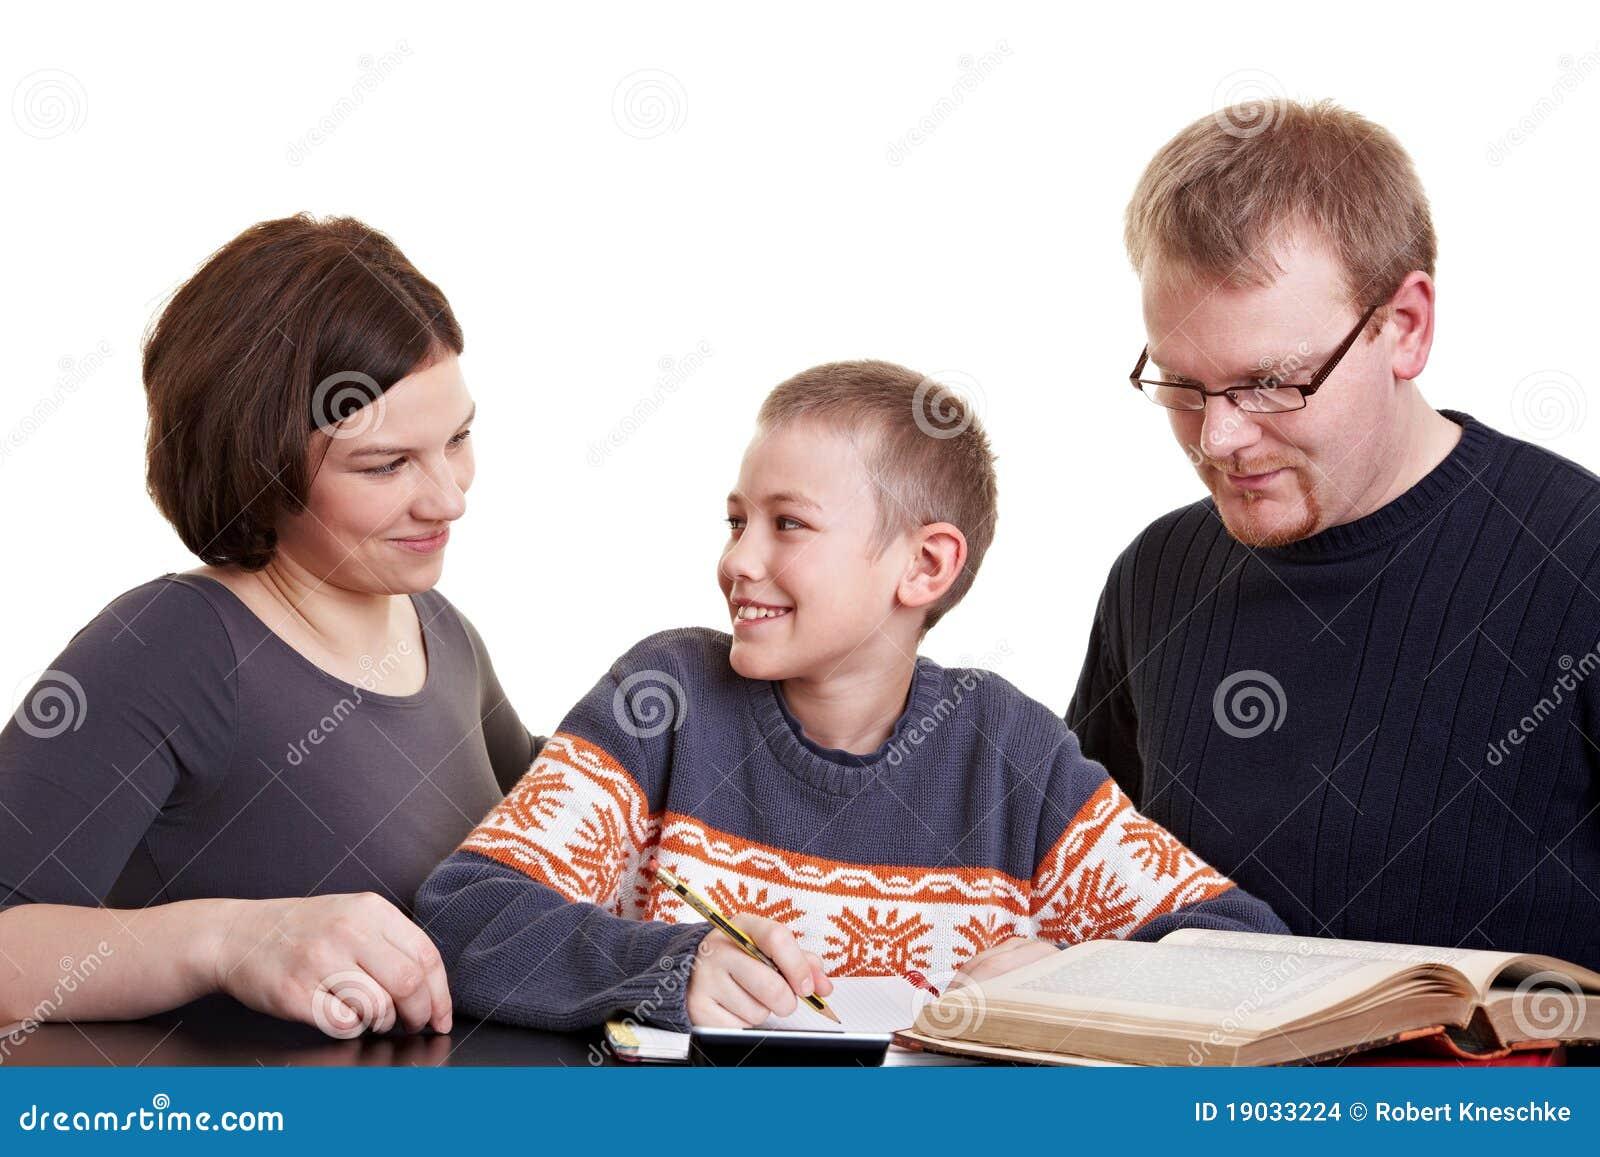 Web homework alert to parents